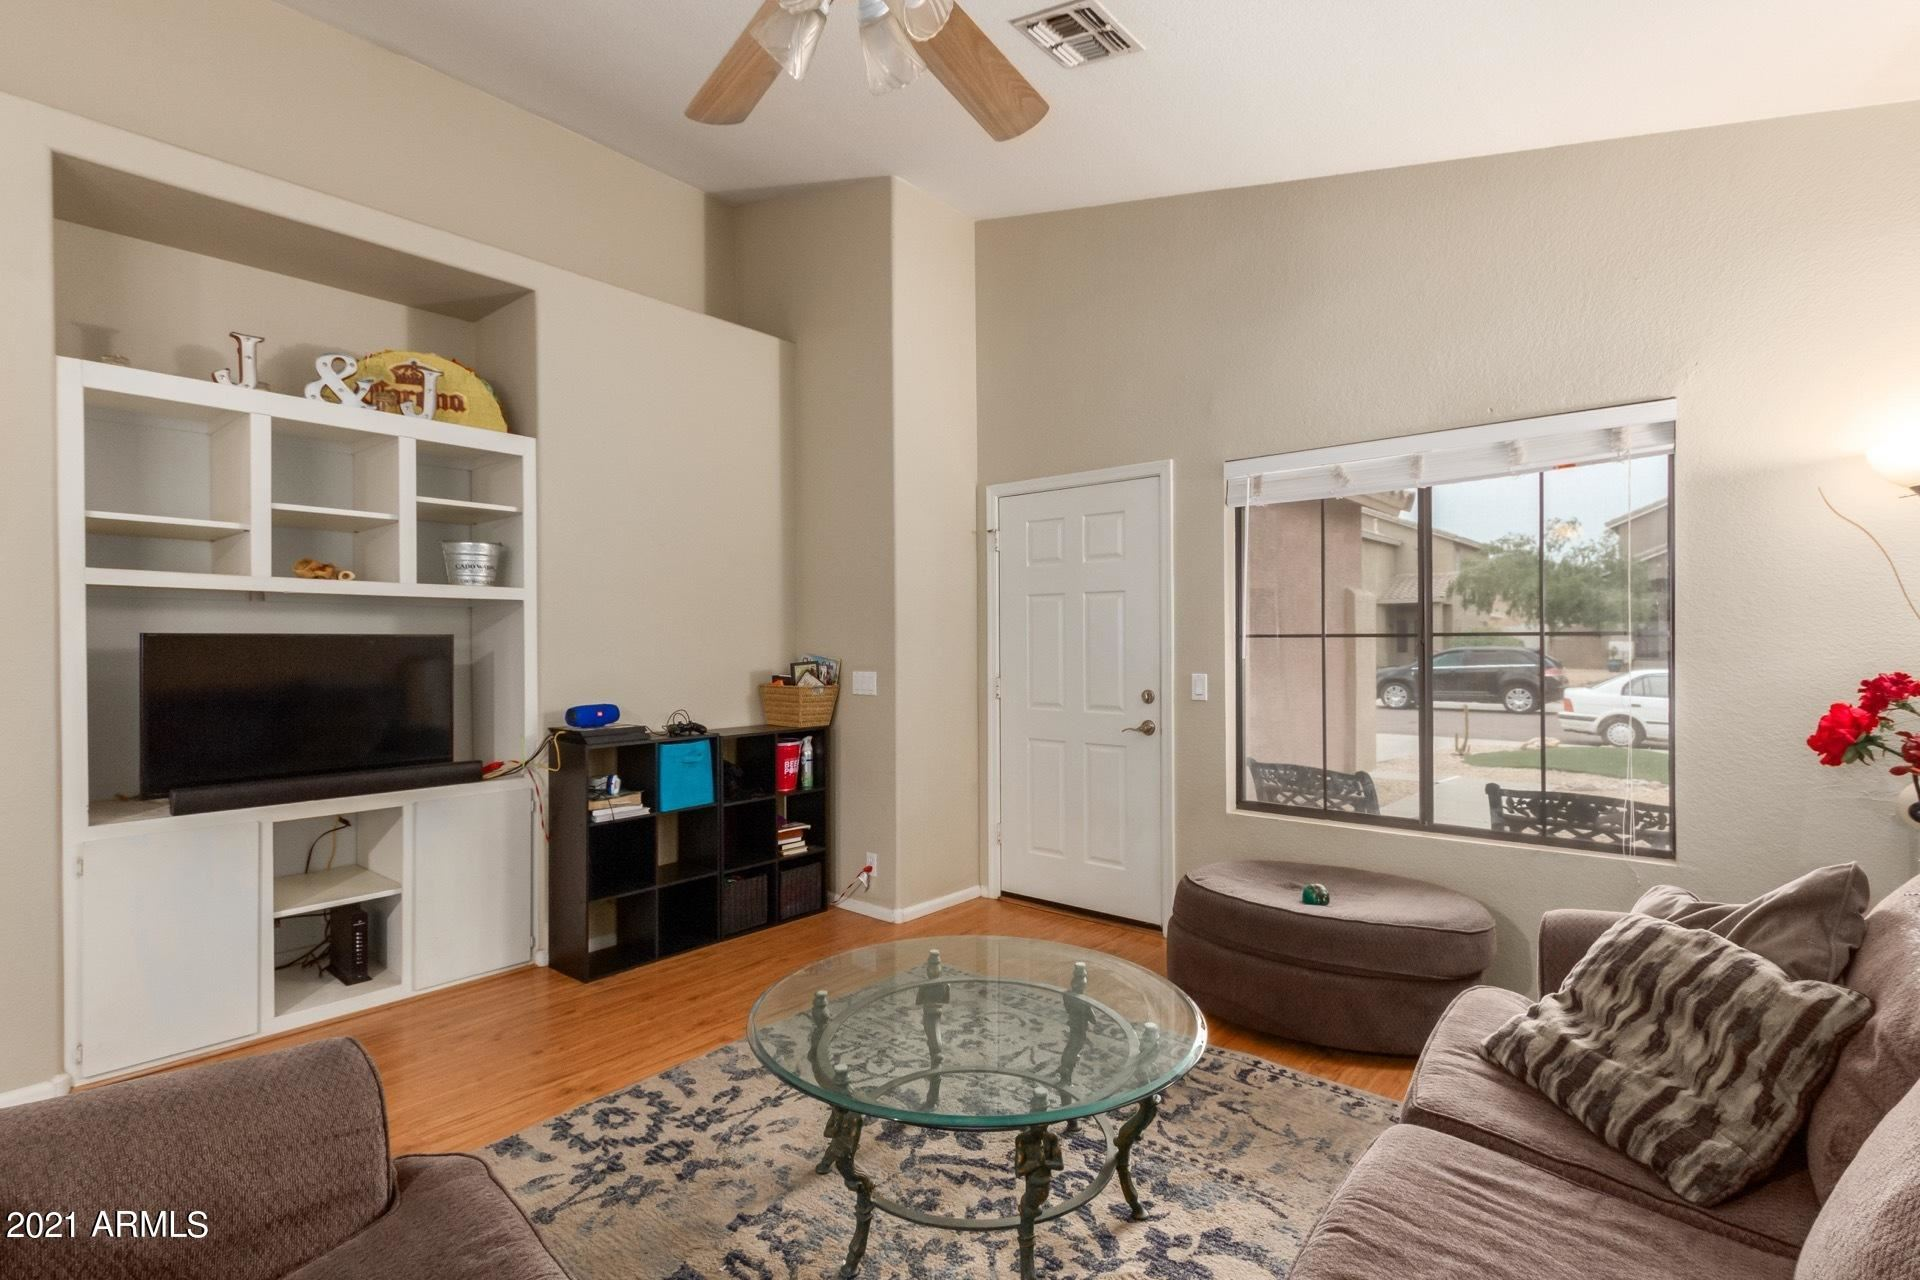 Photo of 8879 W LAUREL Lane, Peoria, AZ 85345 (MLS # 6268472)